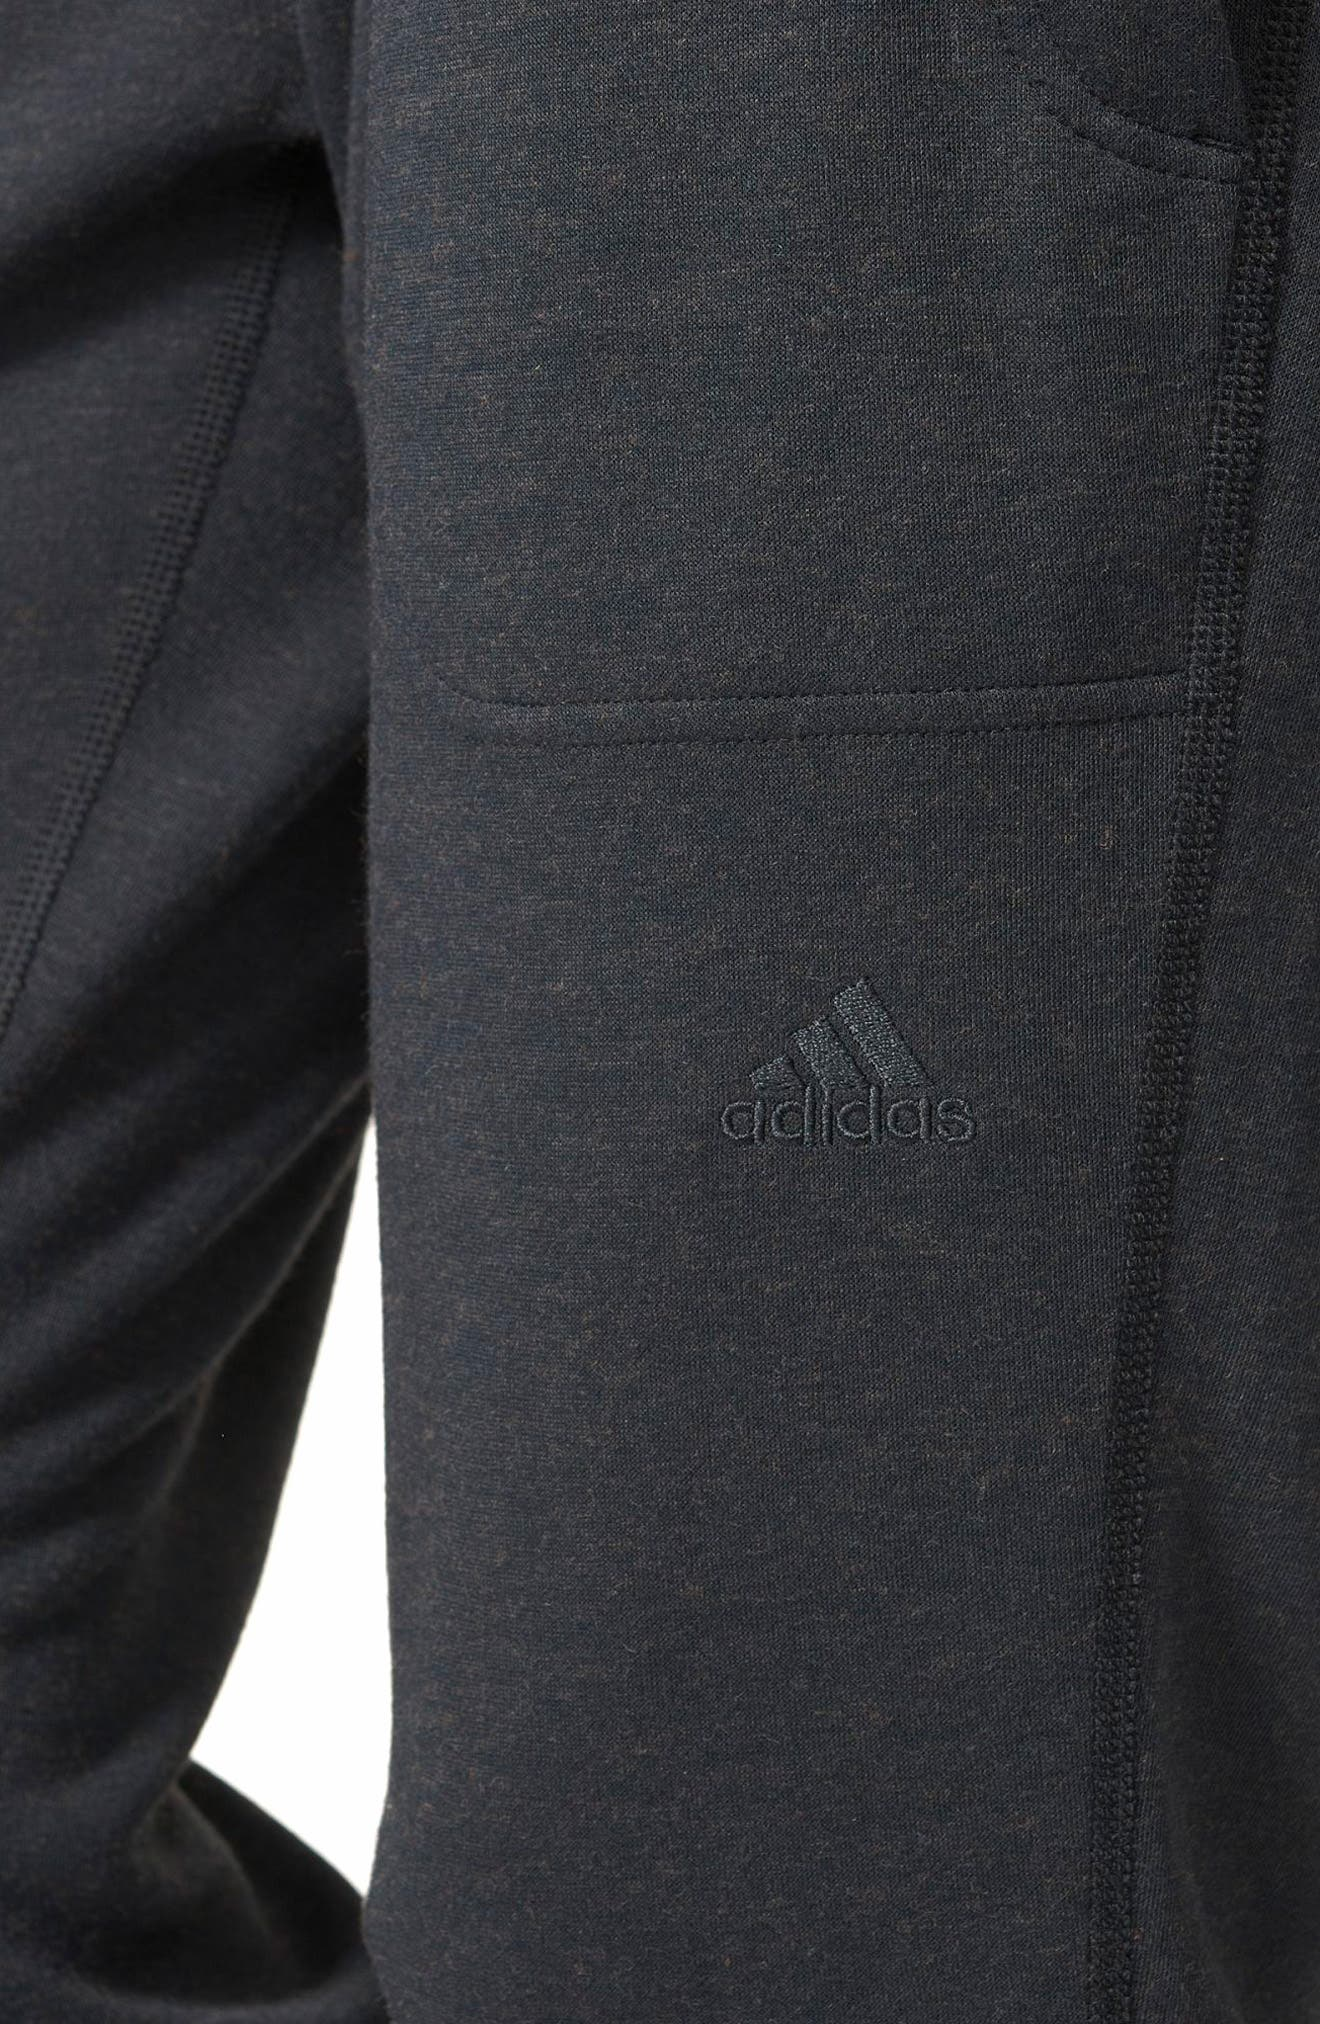 Full Length Golf Pants,                             Alternate thumbnail 8, color,                             001